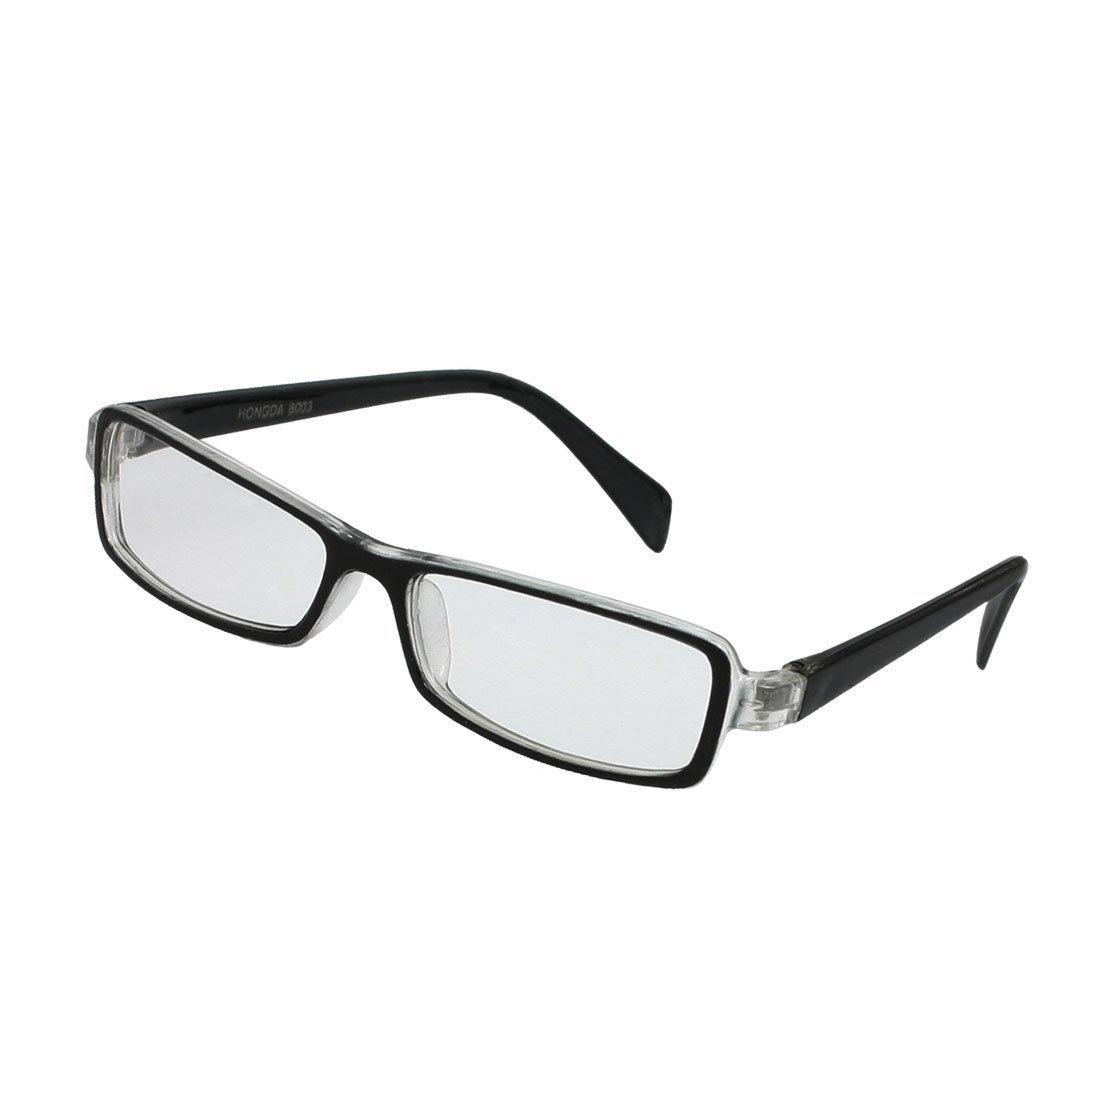 0e384368b5f Get Quotations · LUQUAN Kids Plastic Full Rim Rectangle Lens Plain  Eyeglasses Plano Glasses Black Clear